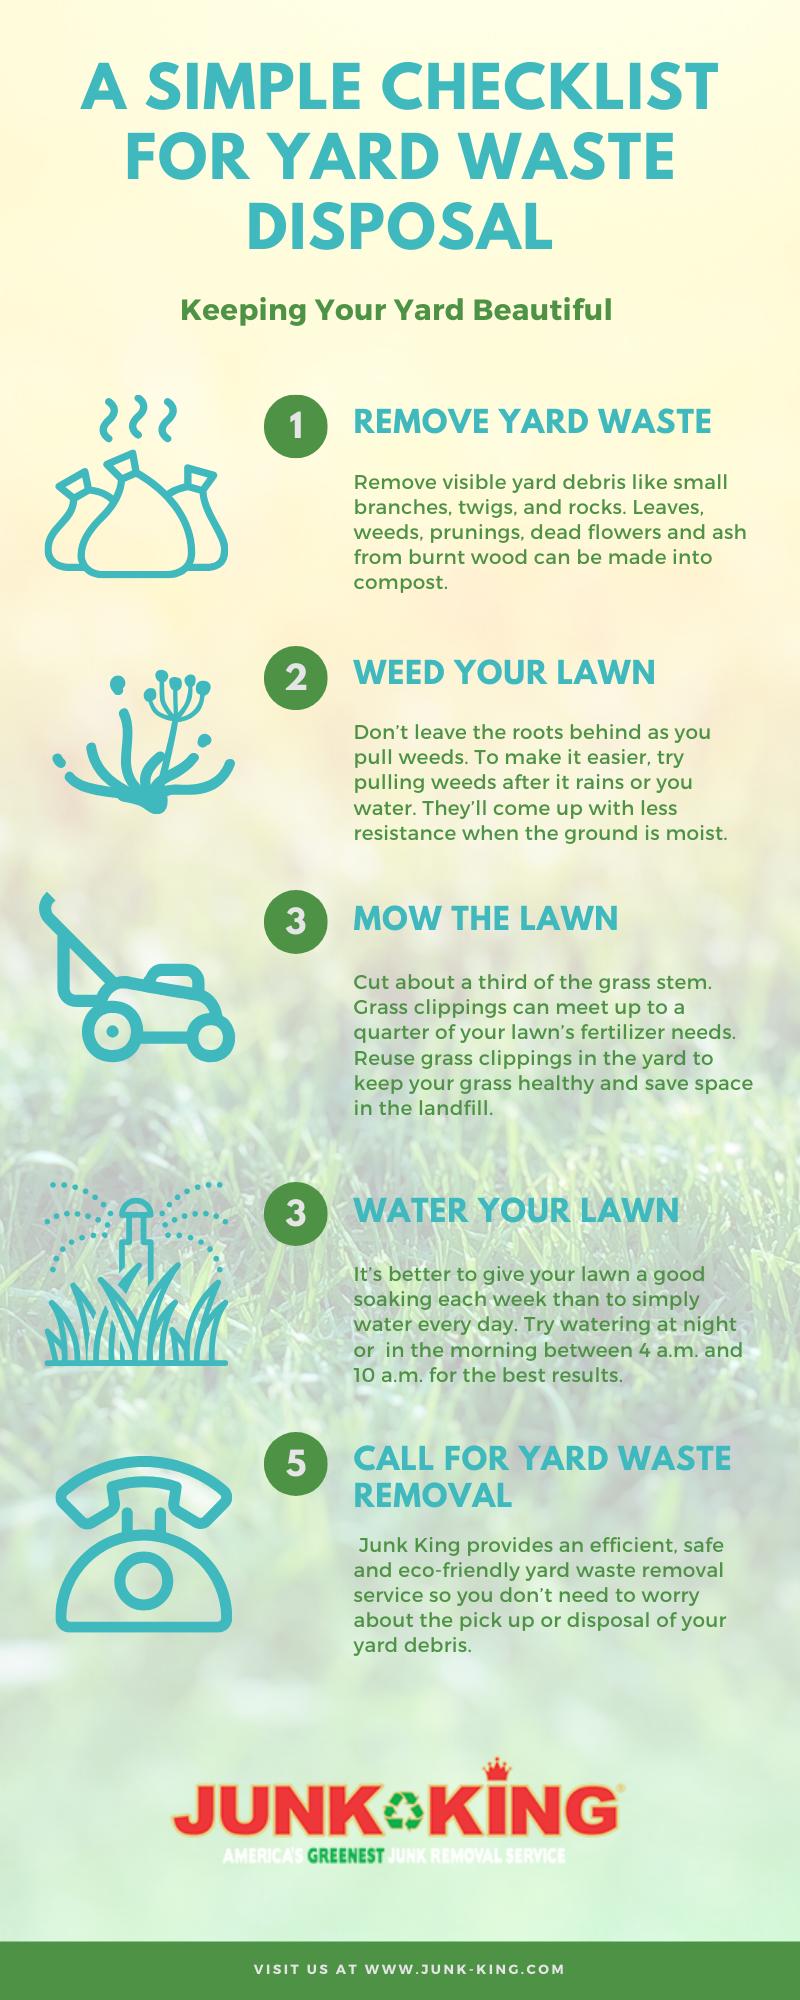 a simple checklist for yard waste disposal-1